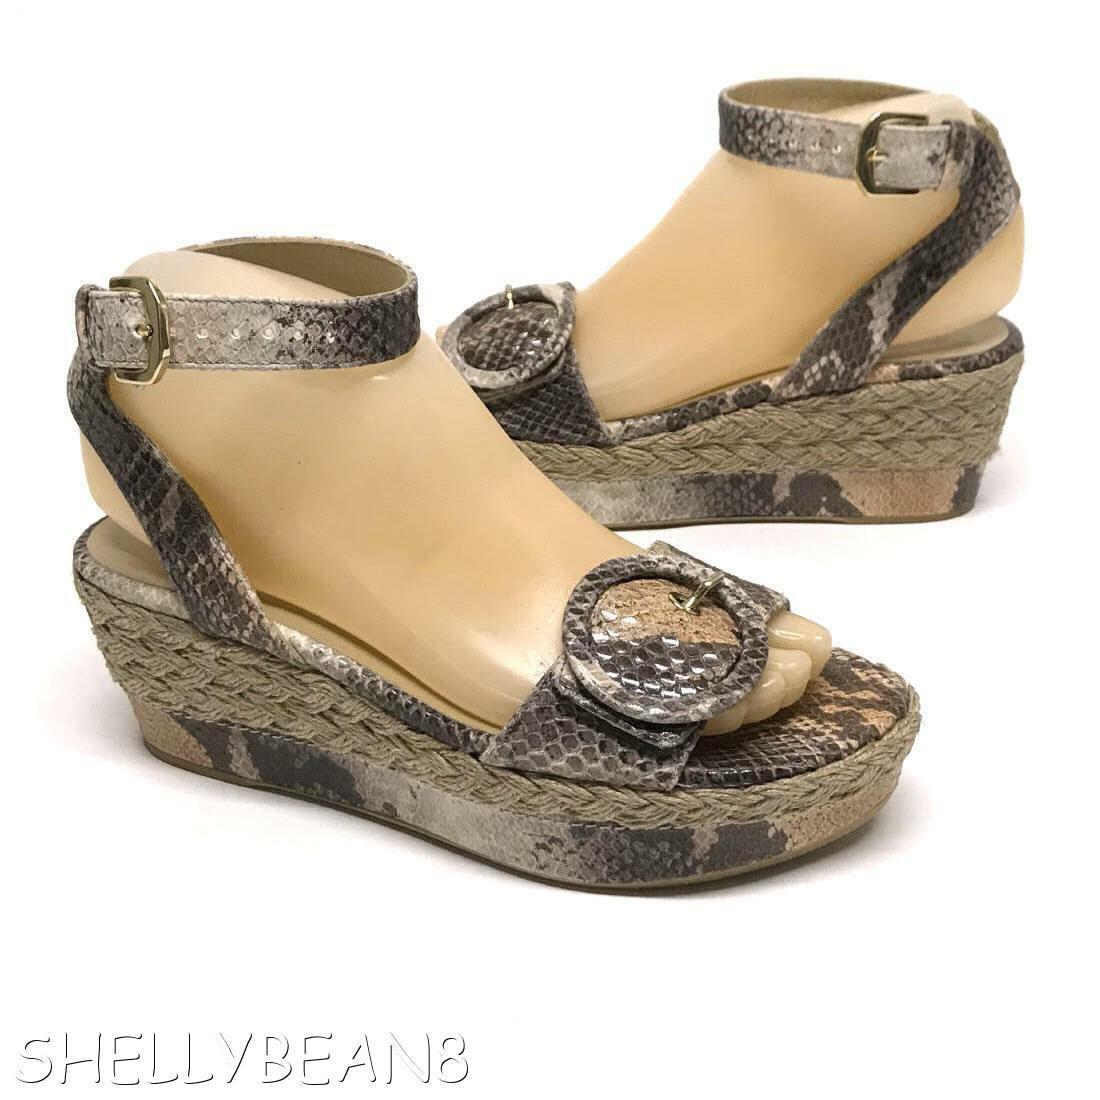 STUART WEITZMAN Platform Espadrilles WEDGE Sandals SNAKE PYTHON Heels 5.5 N  435